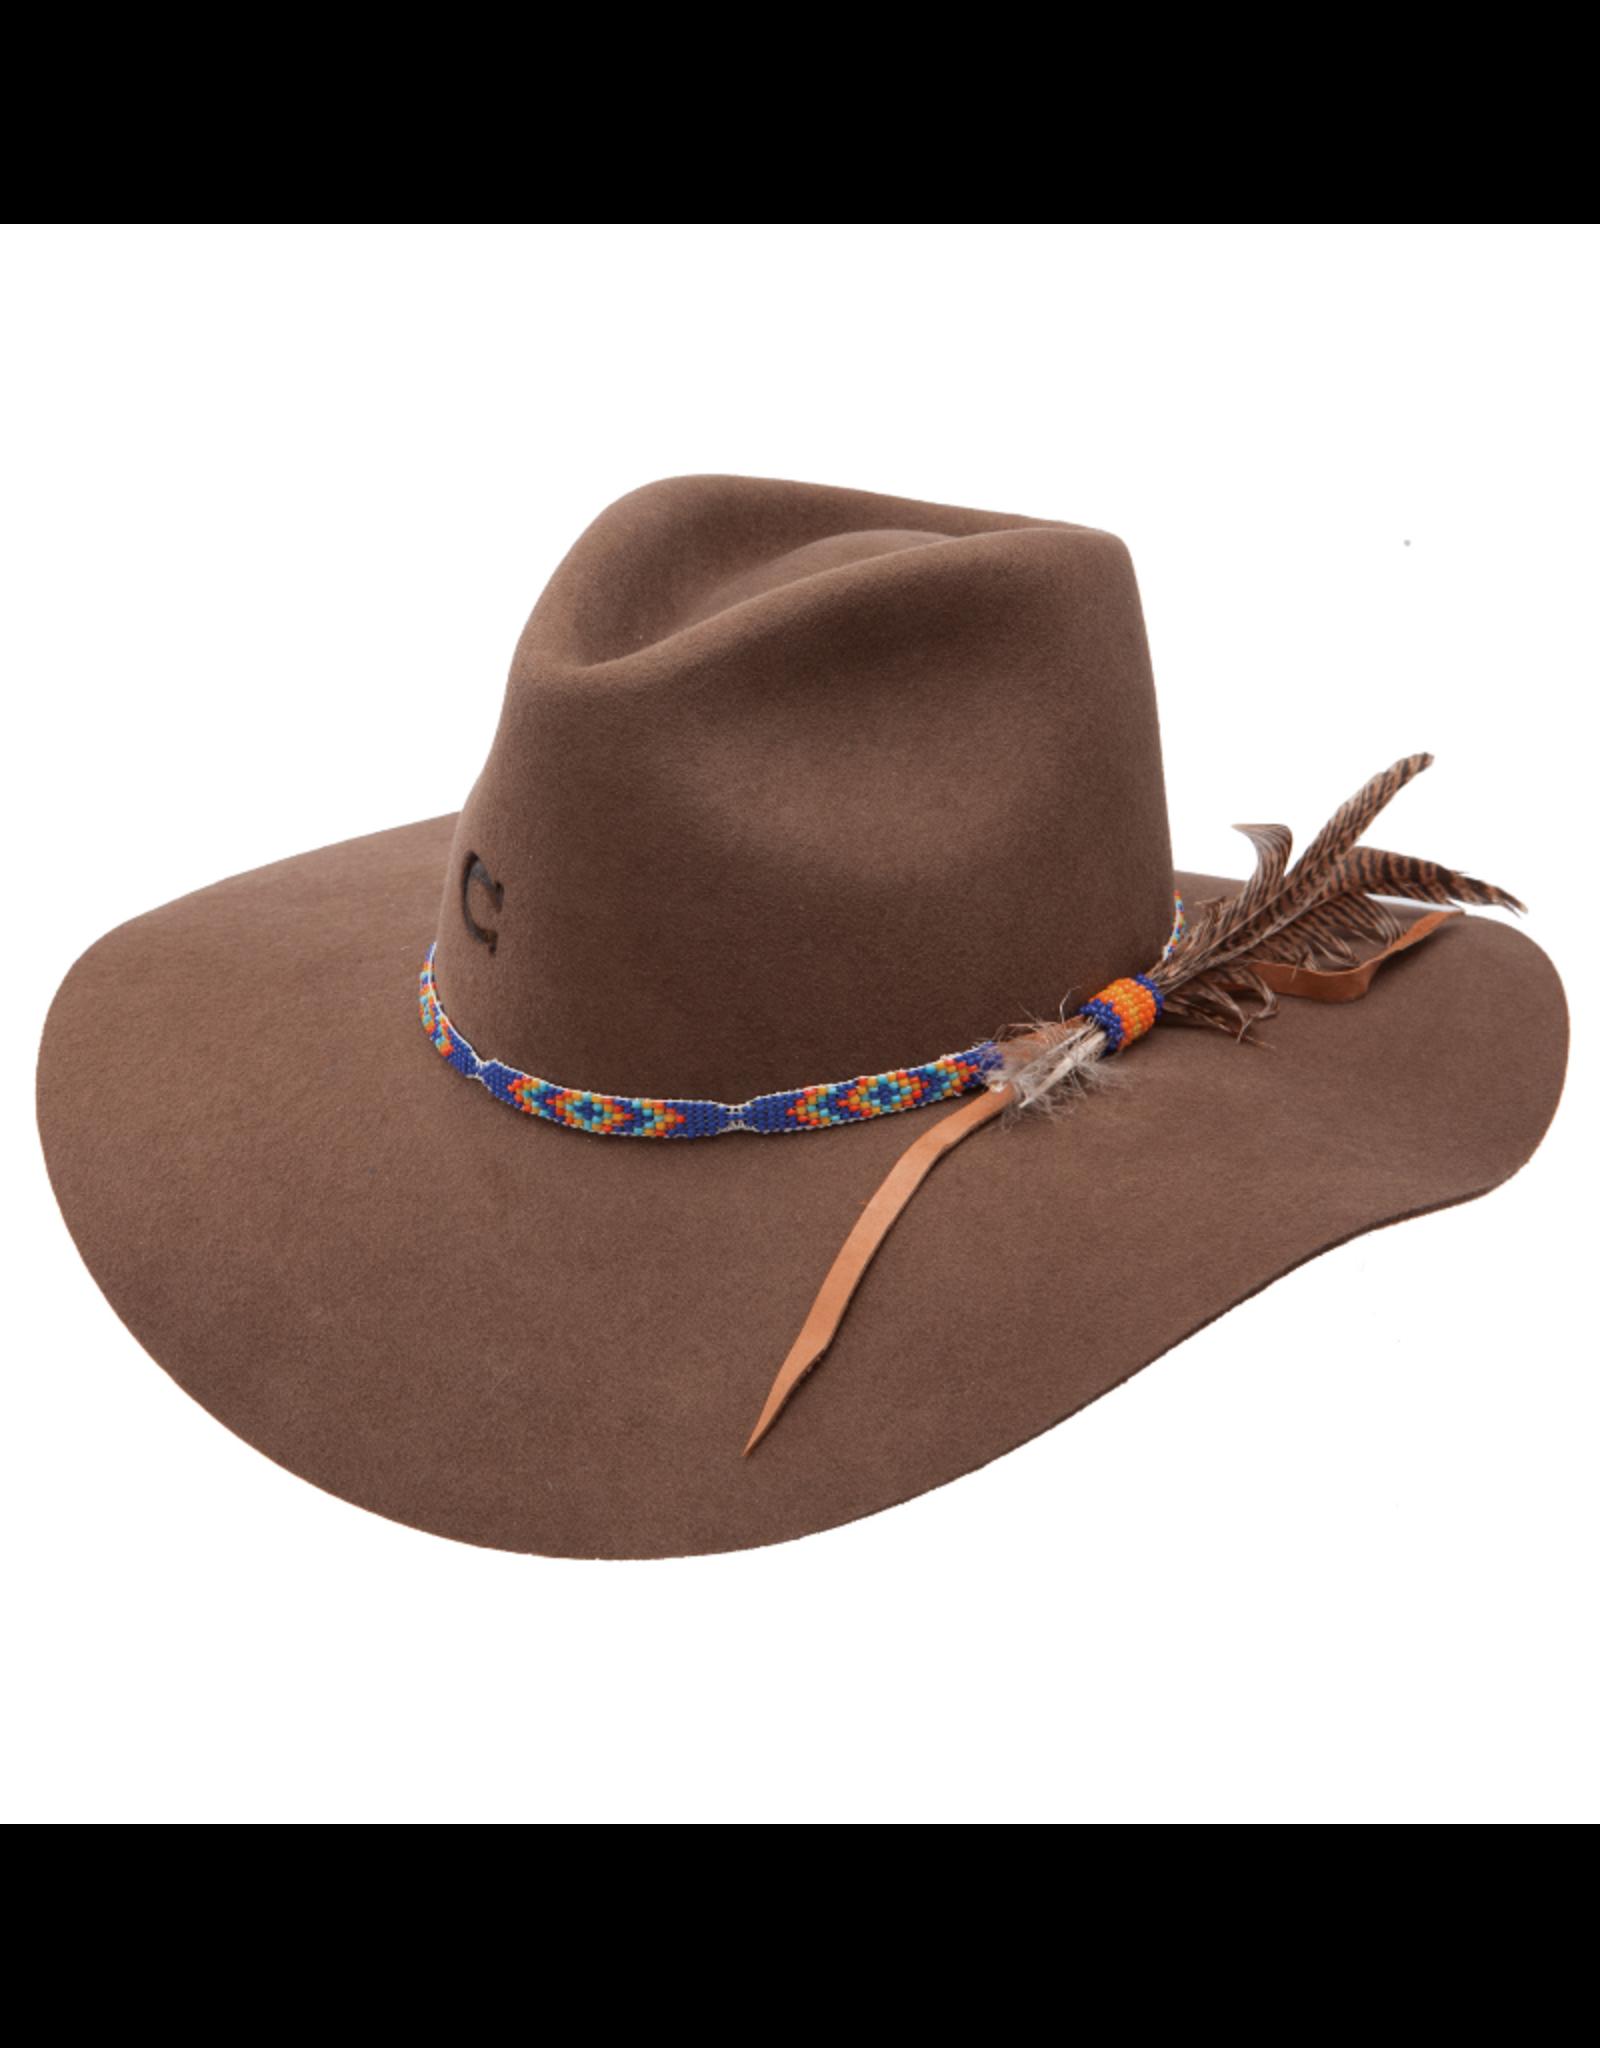 Stetson Hats Stetson Charlie 1 Horse Gypsy Felt Hat